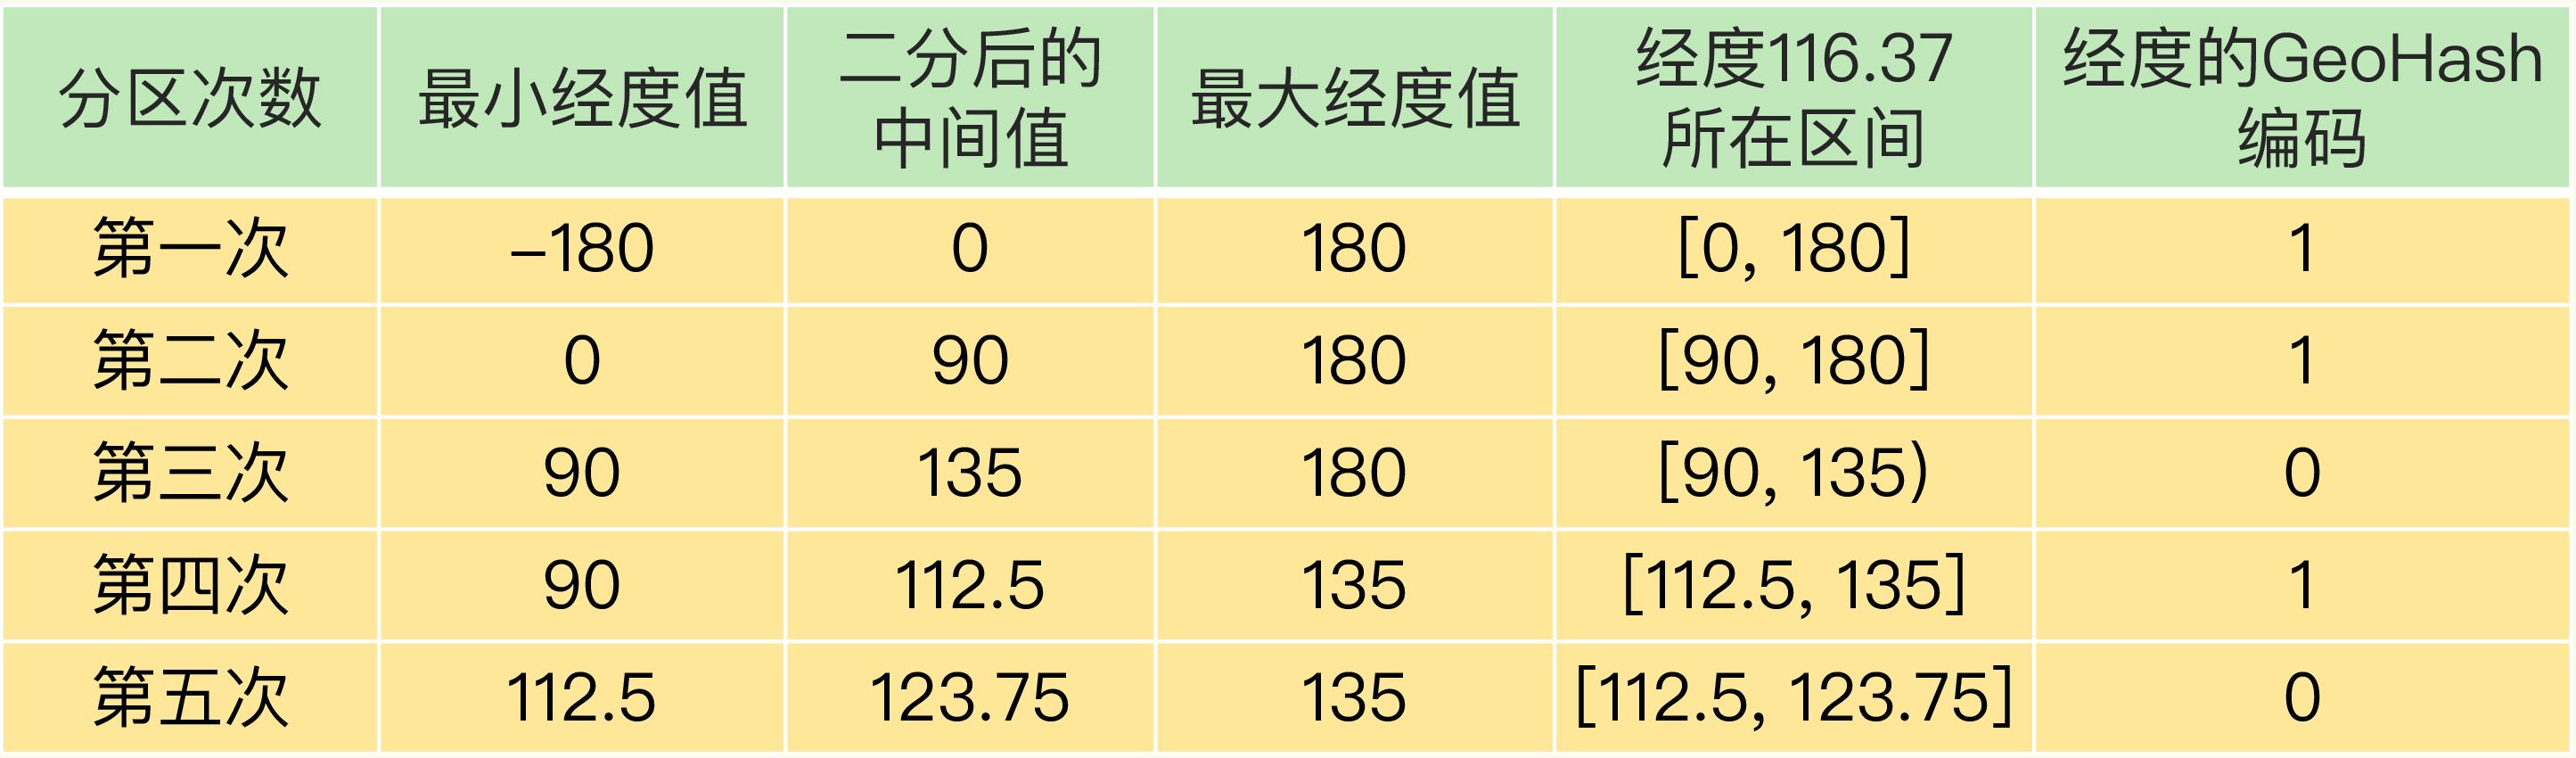 Redis%E7%9A%84%E9%83%A8%E5%88%86%E4%BD%BF%E7%94%A8%E6%B3%A8%E6%84%8F%E7%82%B9%20763b90558c7c4ab0ae32a02616a3e4f2/Untitled%204.png